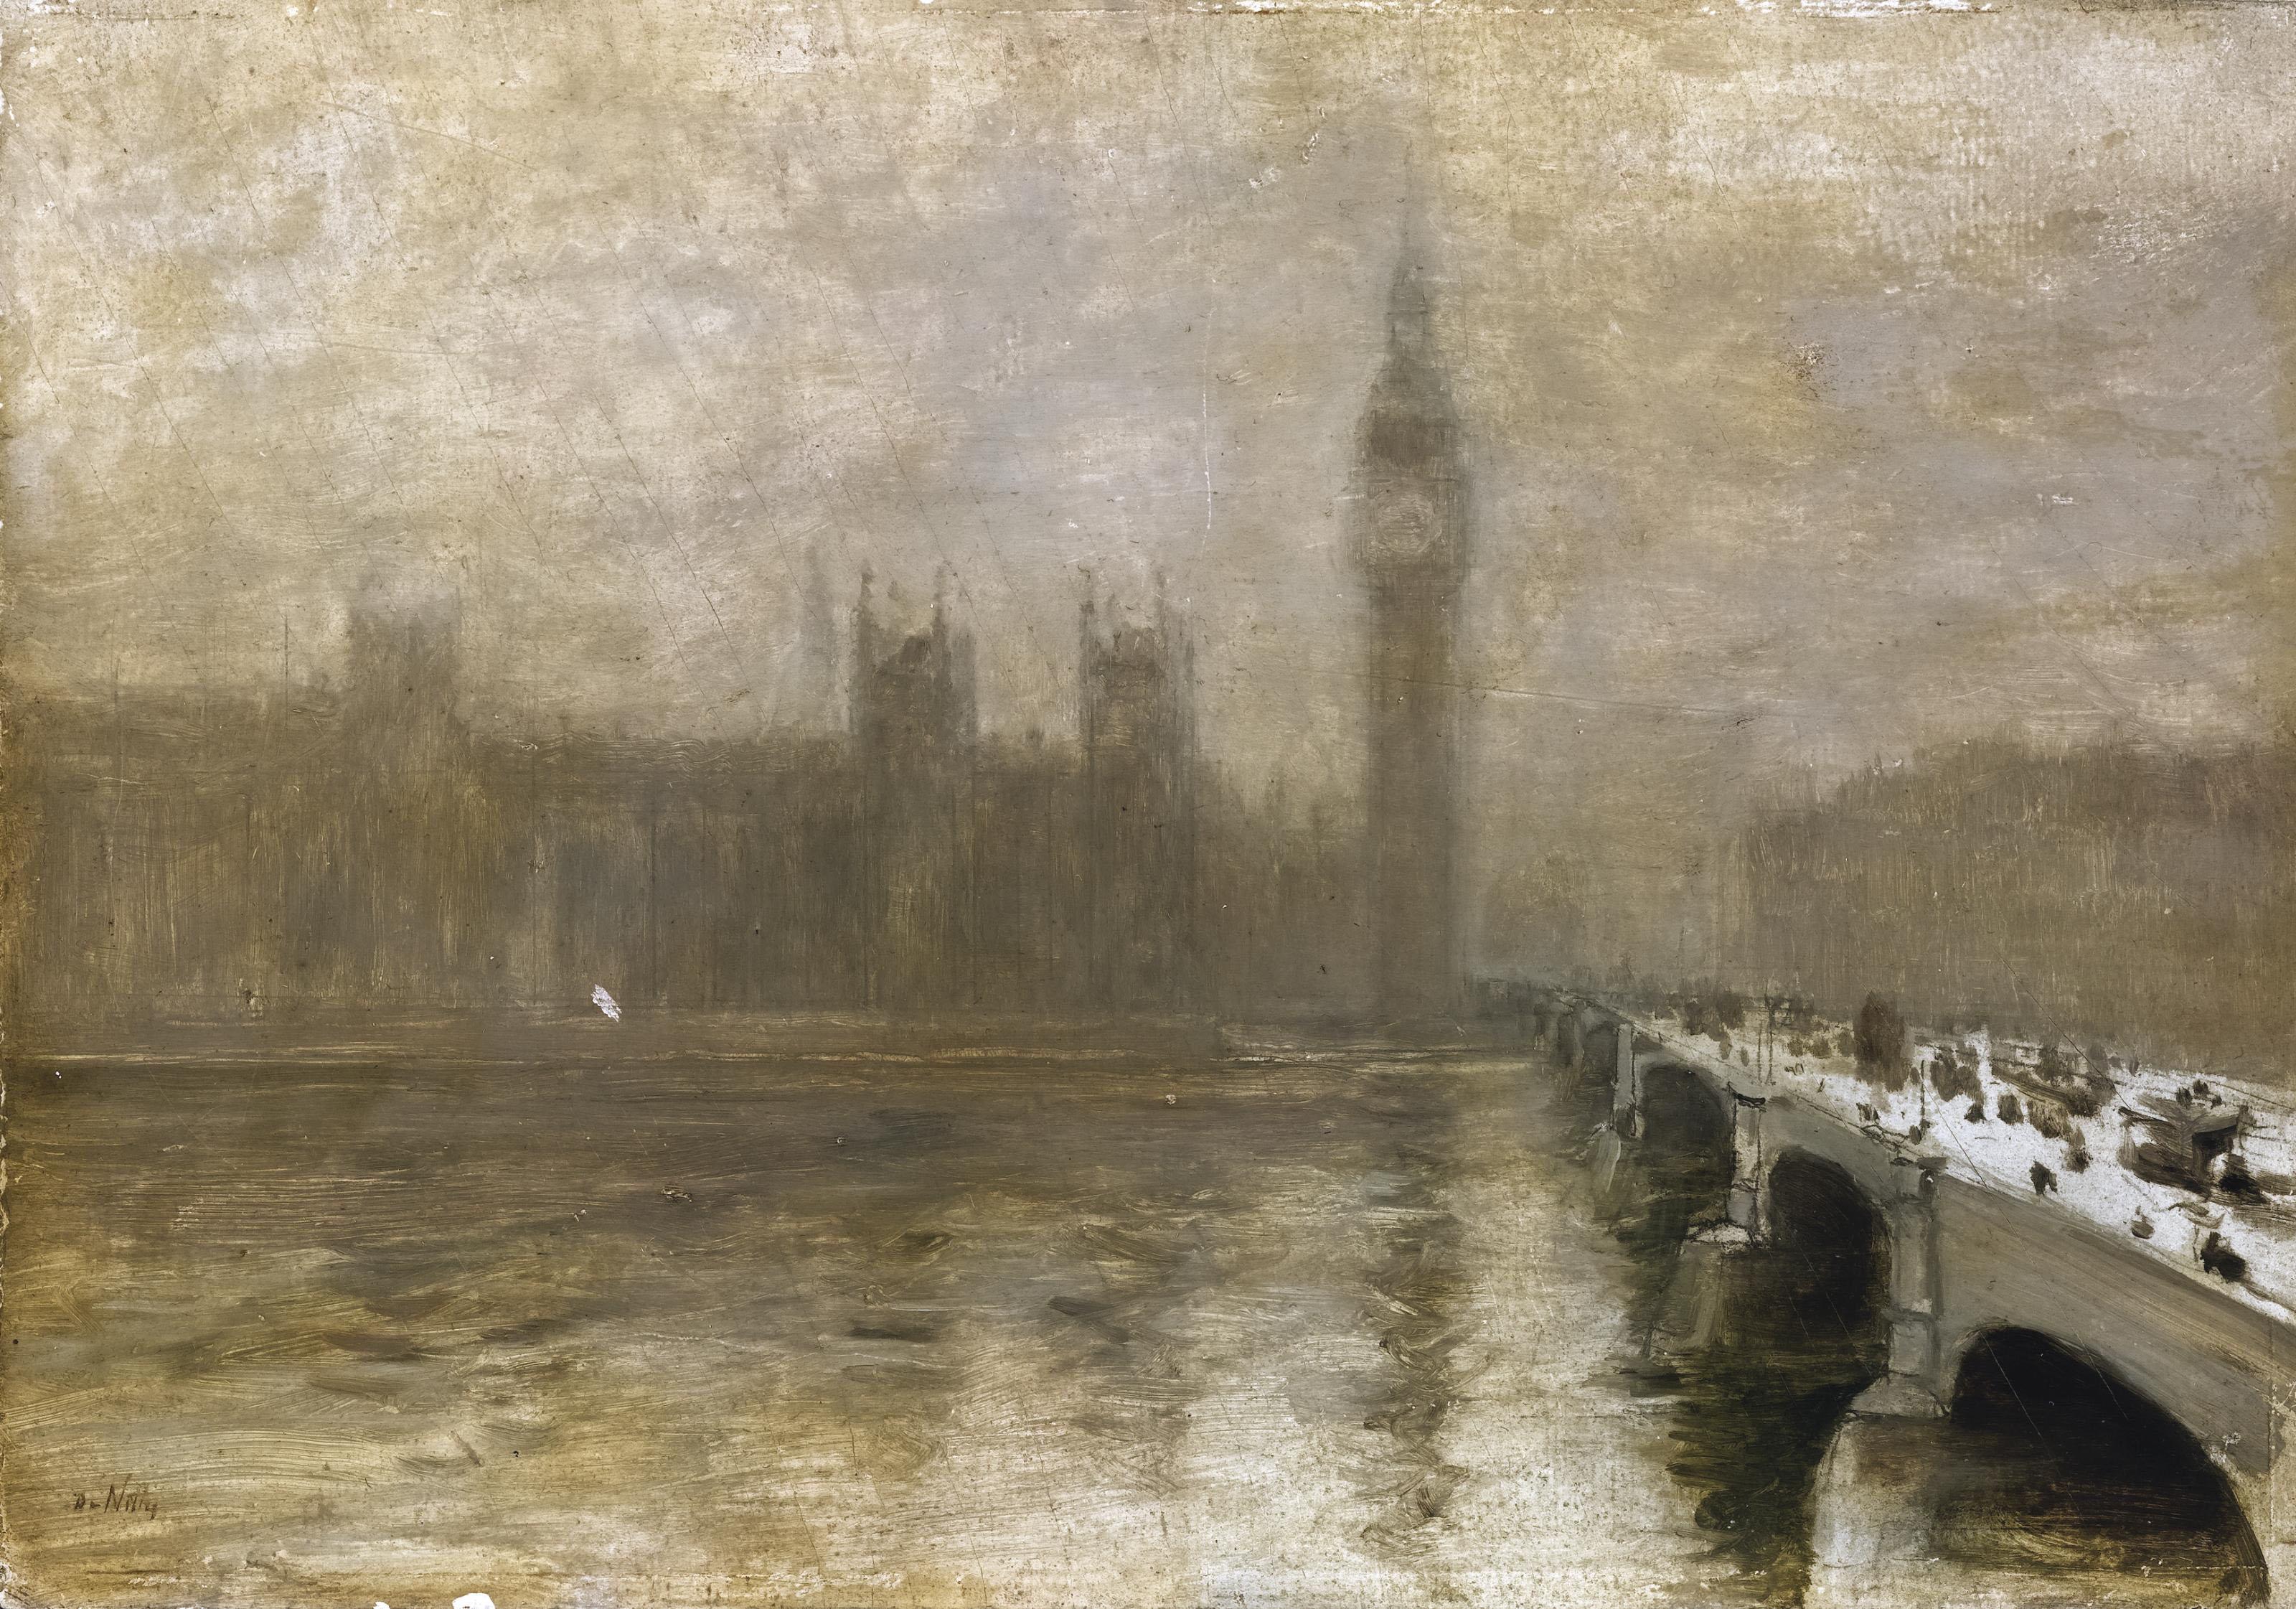 Londra, il ponte di Westminster